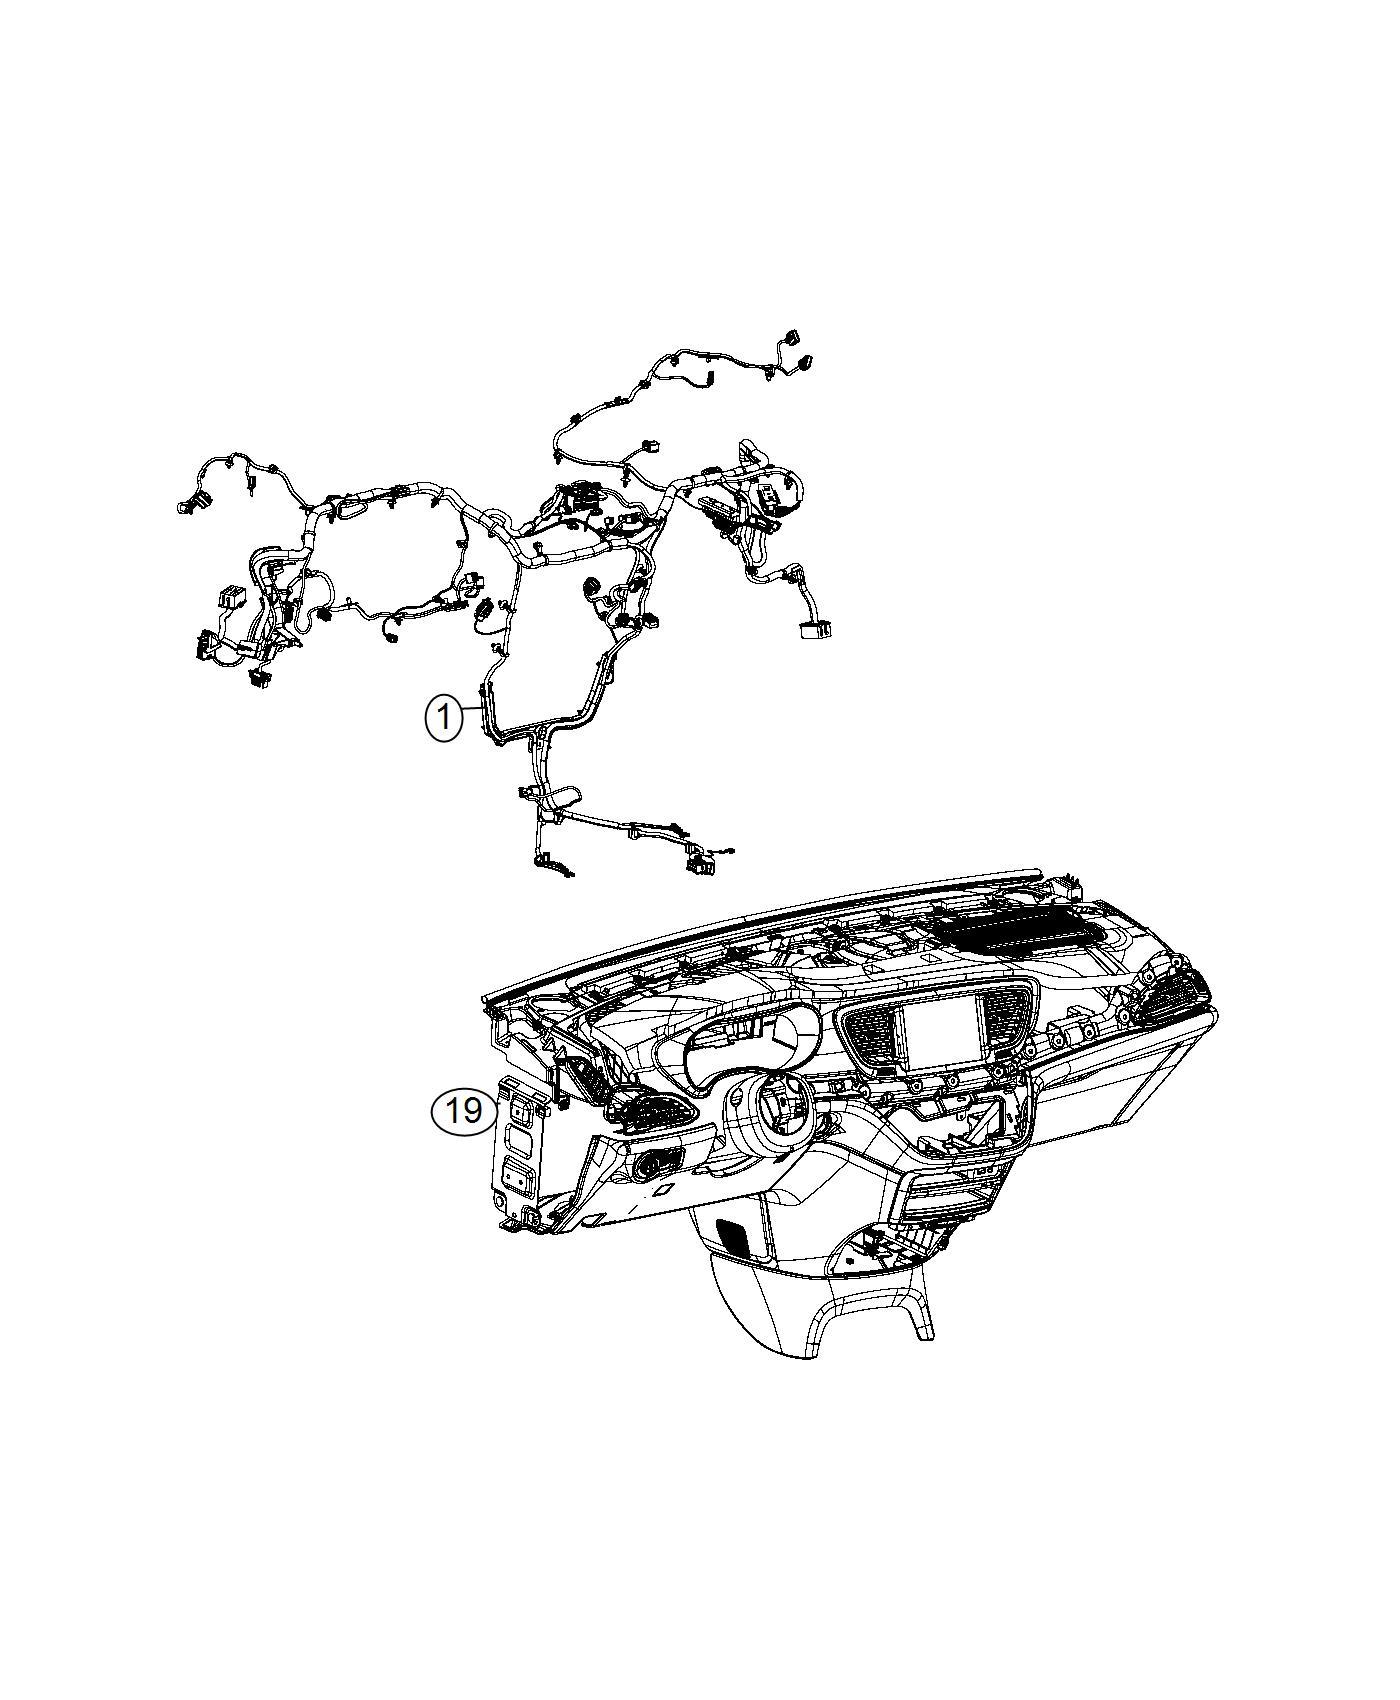 Chrysler Pacifica Bracket. Connector. Star connector